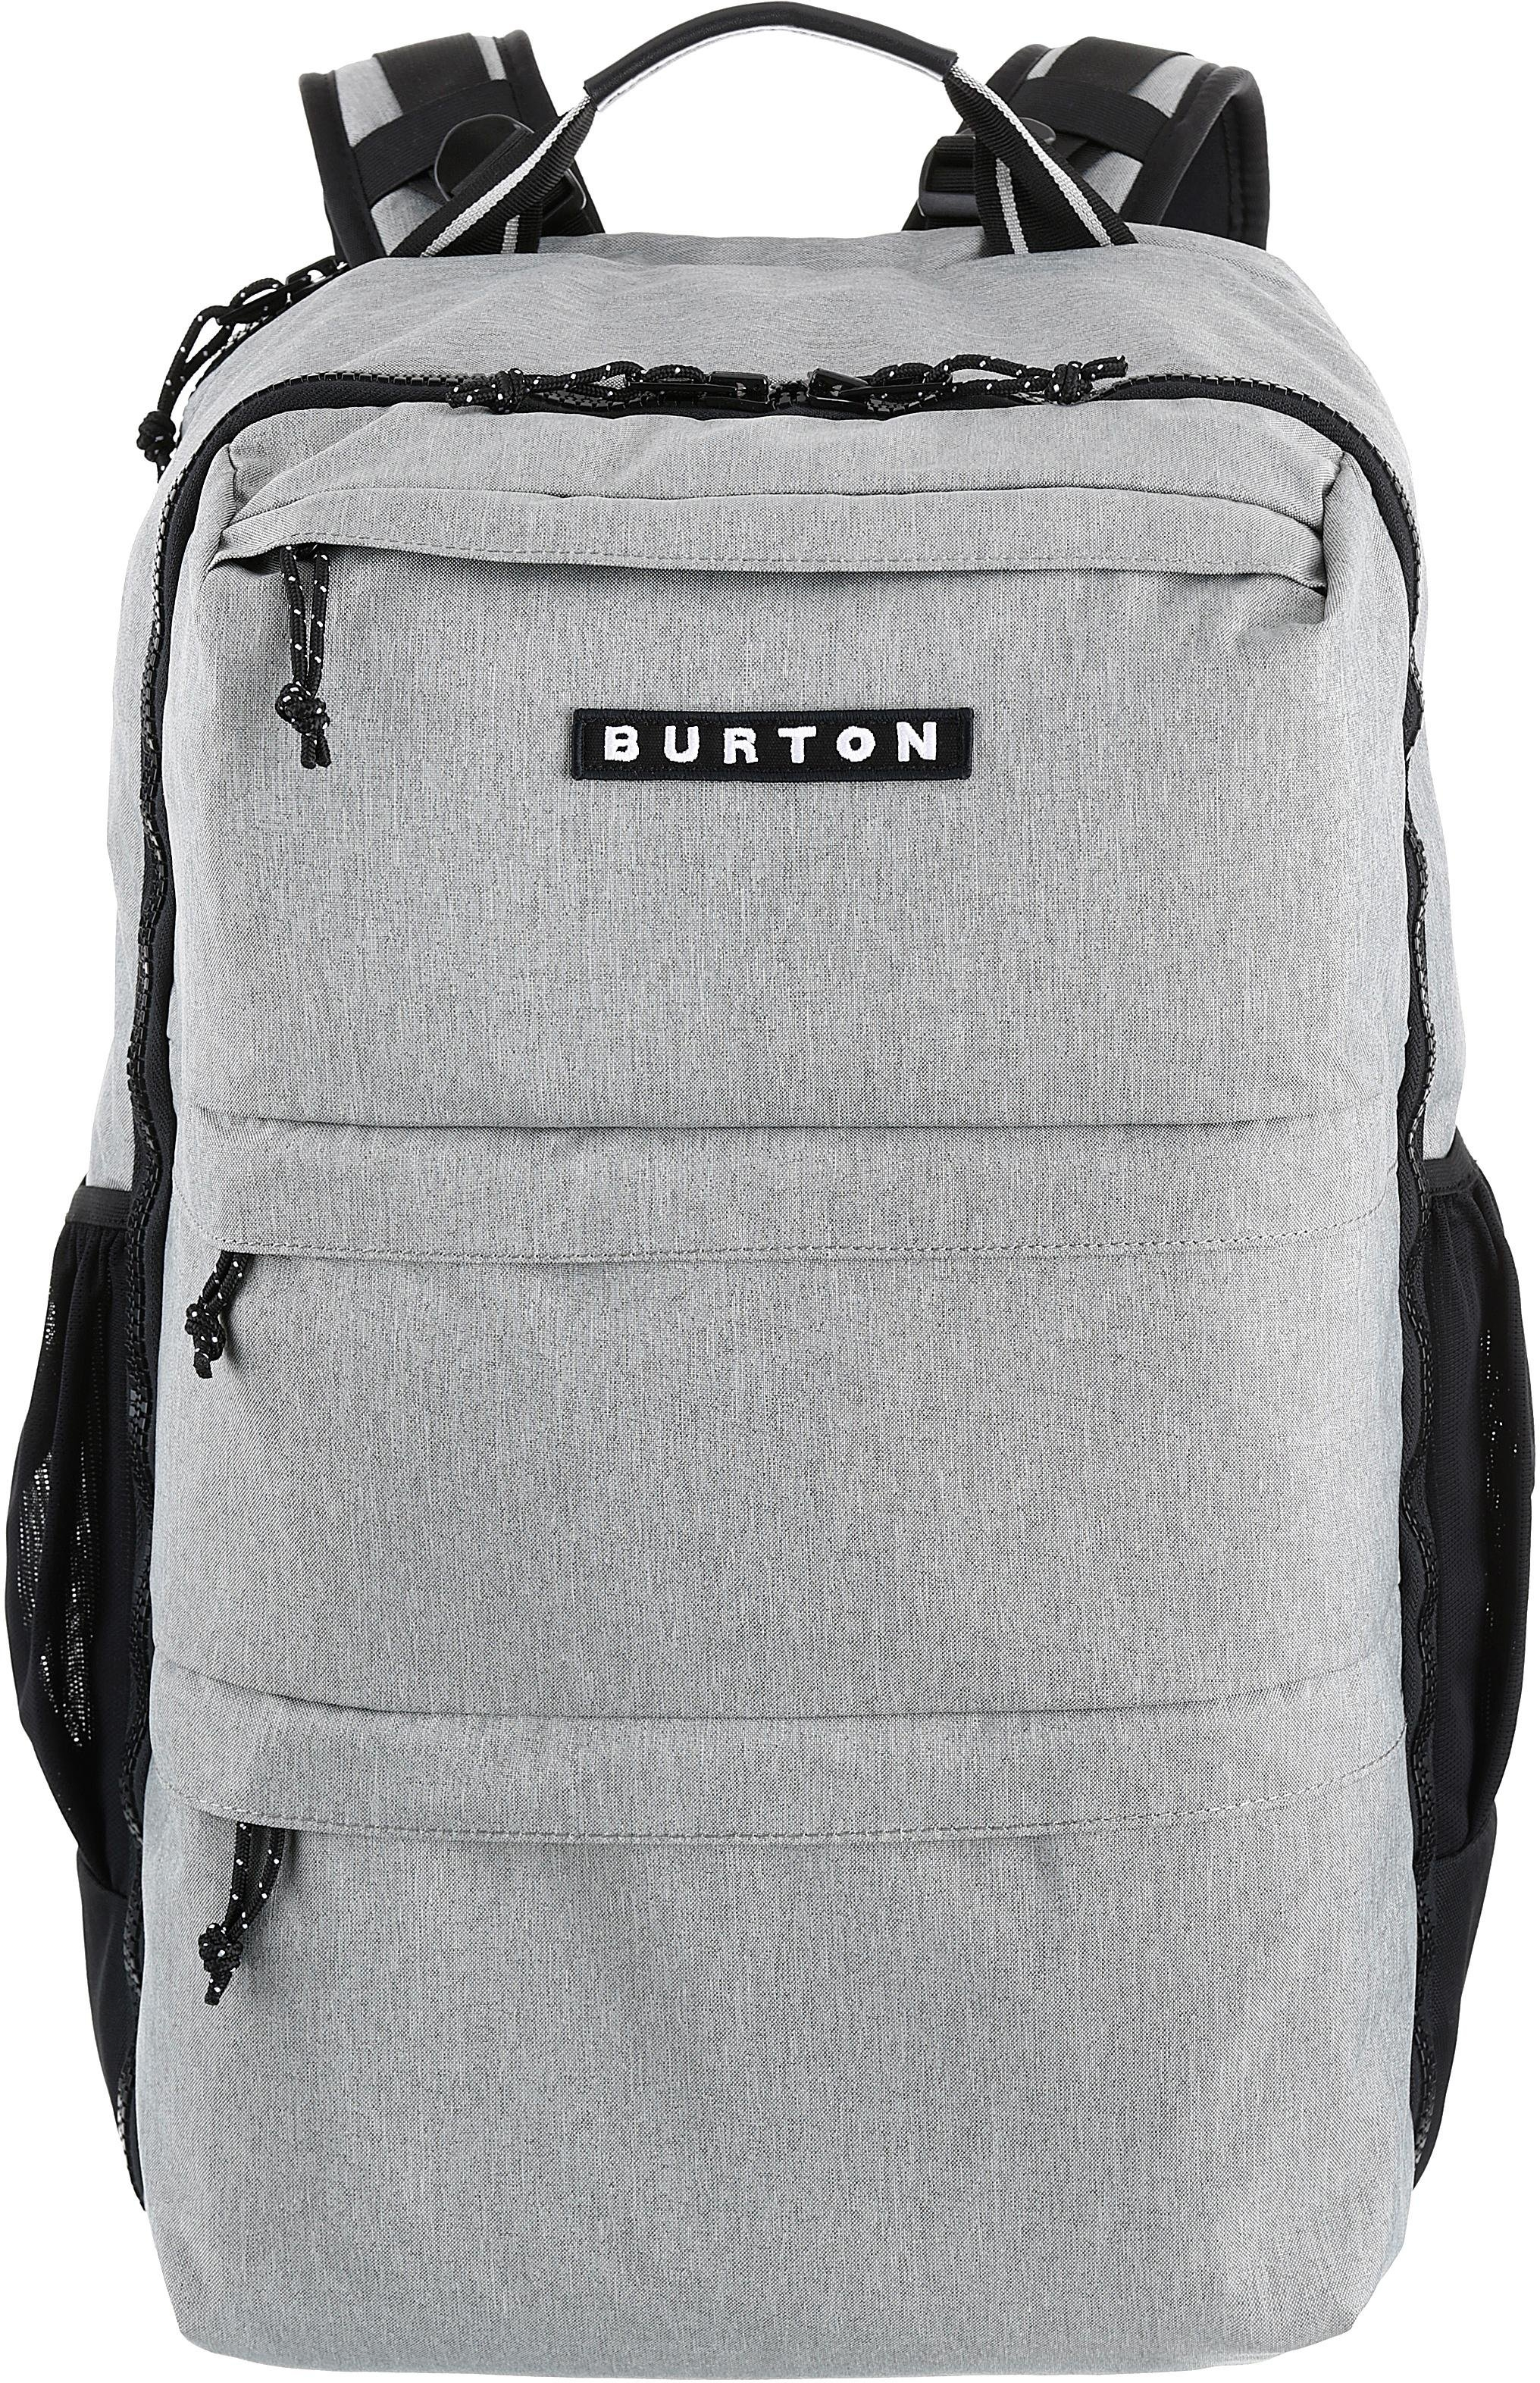 Burton Dg Burton rugzak met laptopvak, »Traverse, Grey Heather« online kopen op otto.nl